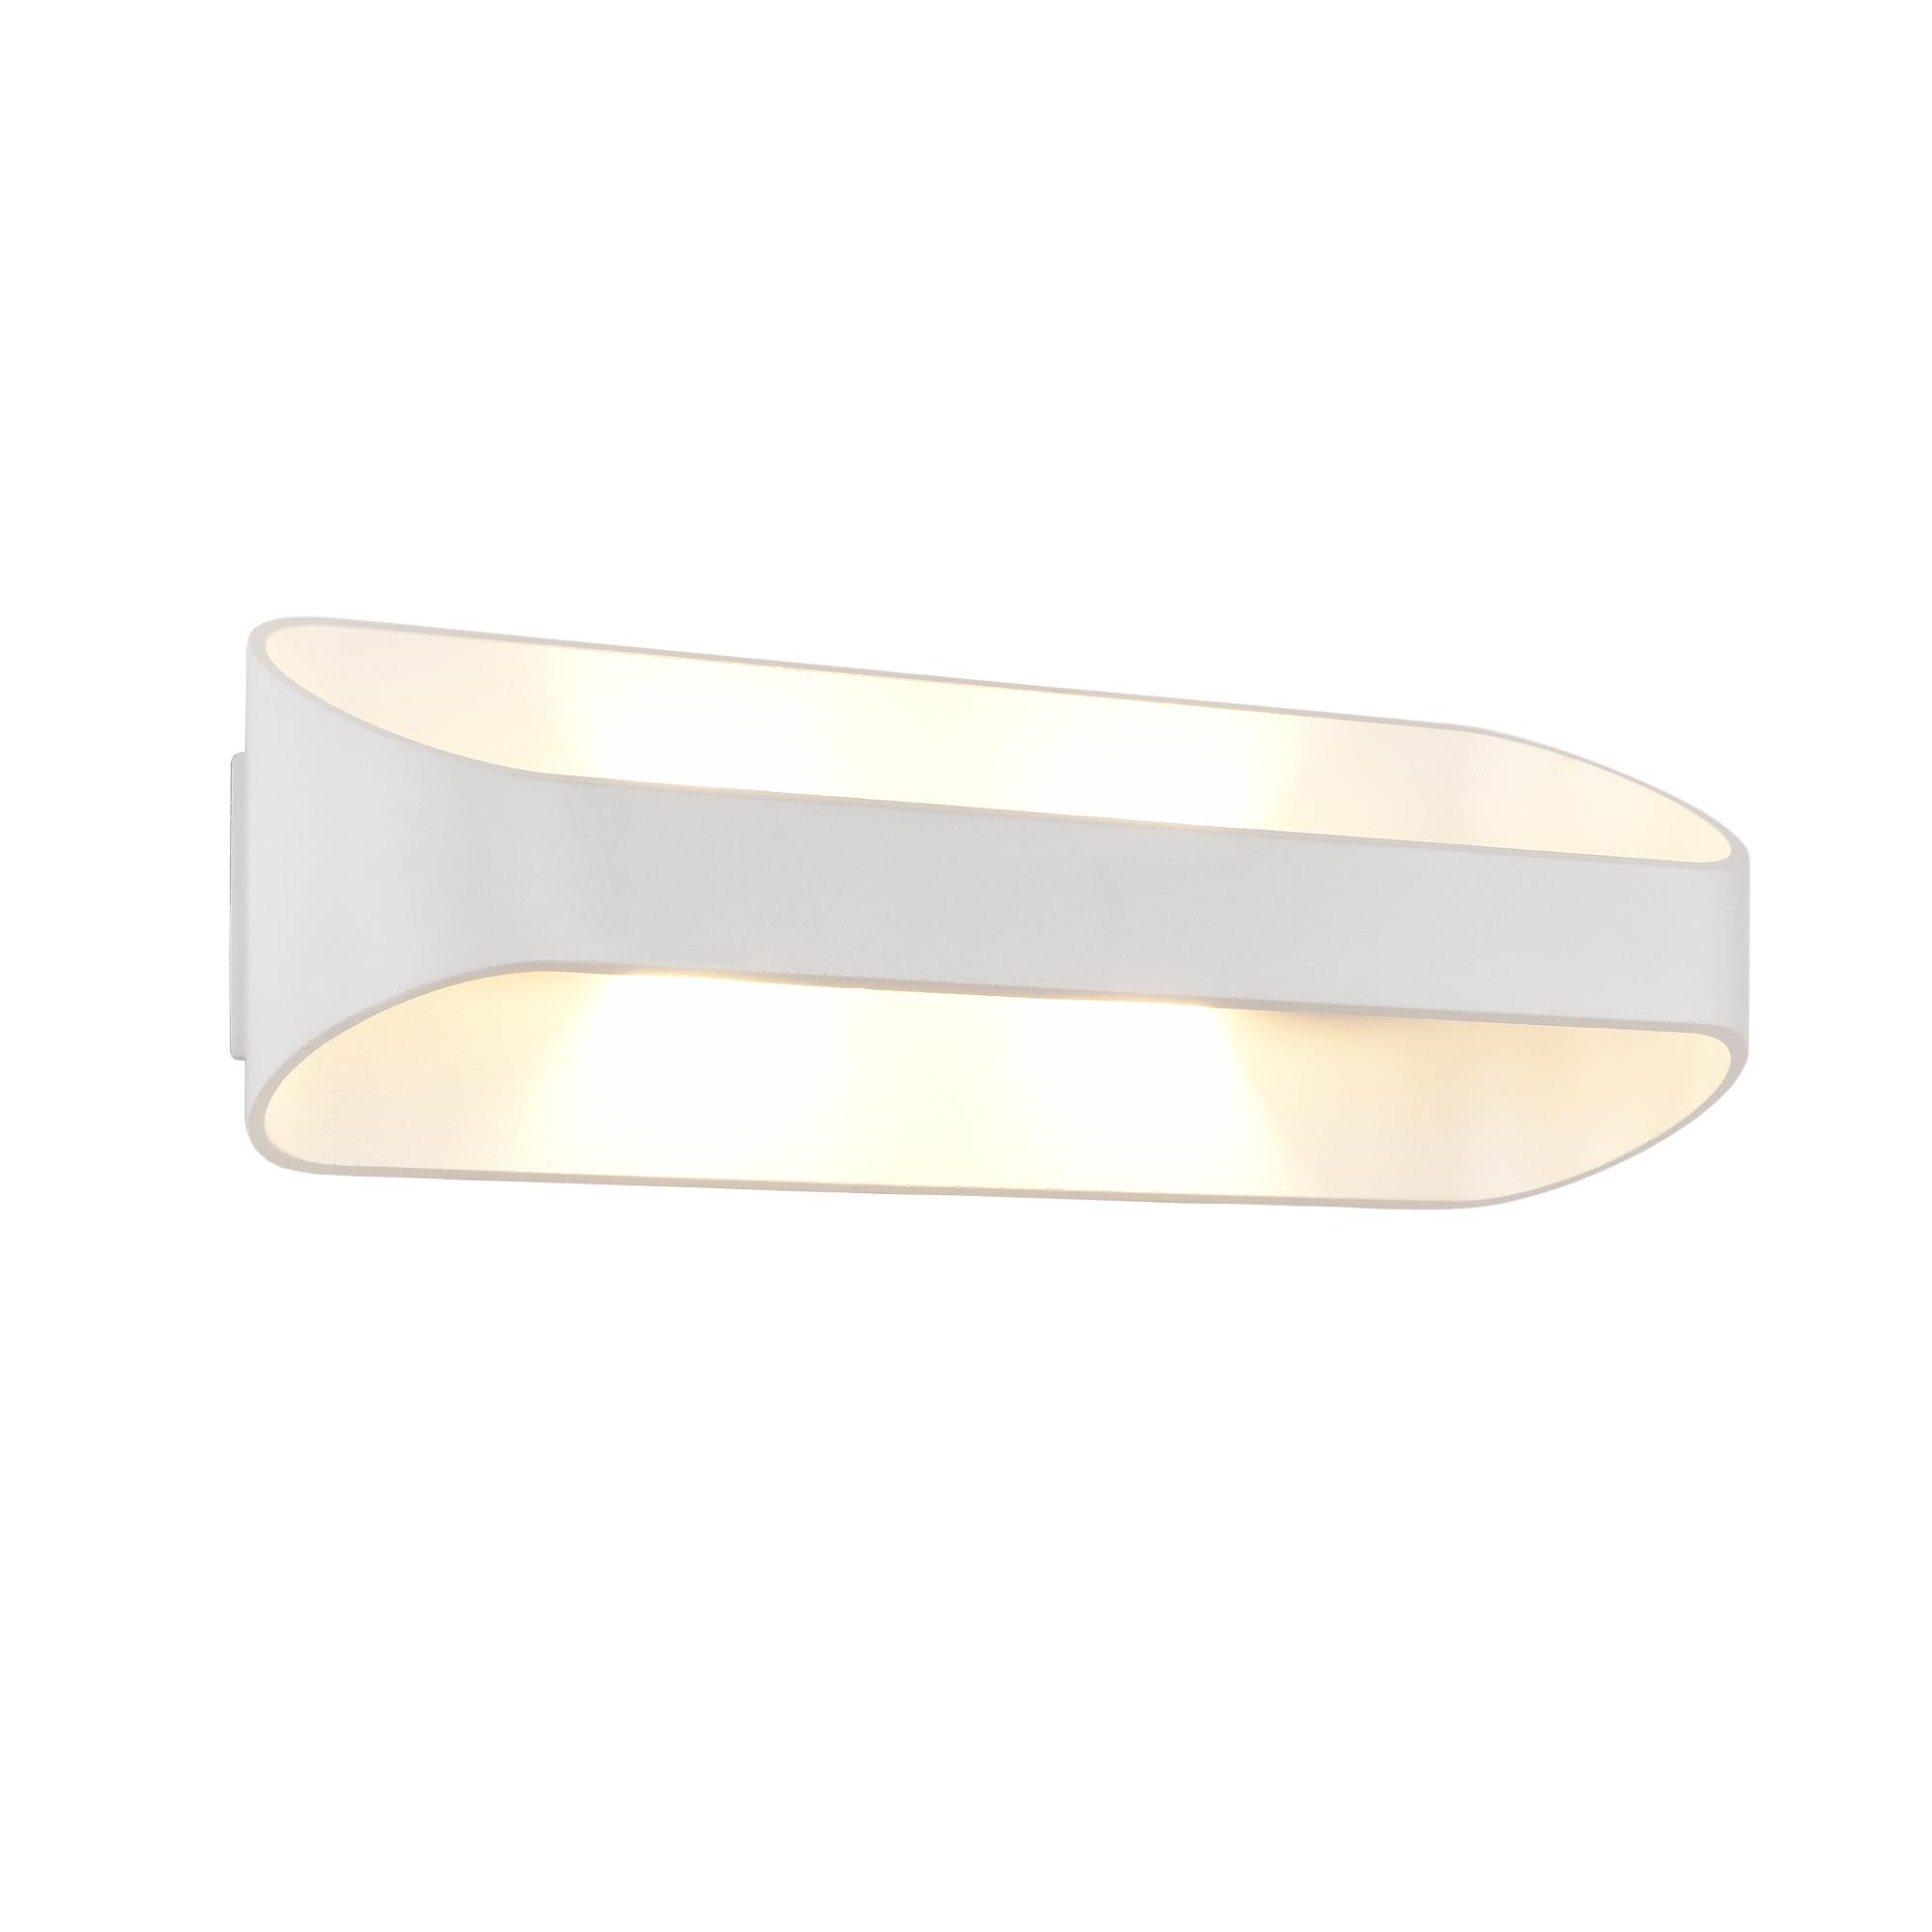 wandleuchte wei 2xg9 wandlampe beleuchtung flurlampe wandstrahler 4251155588875 ebay. Black Bedroom Furniture Sets. Home Design Ideas